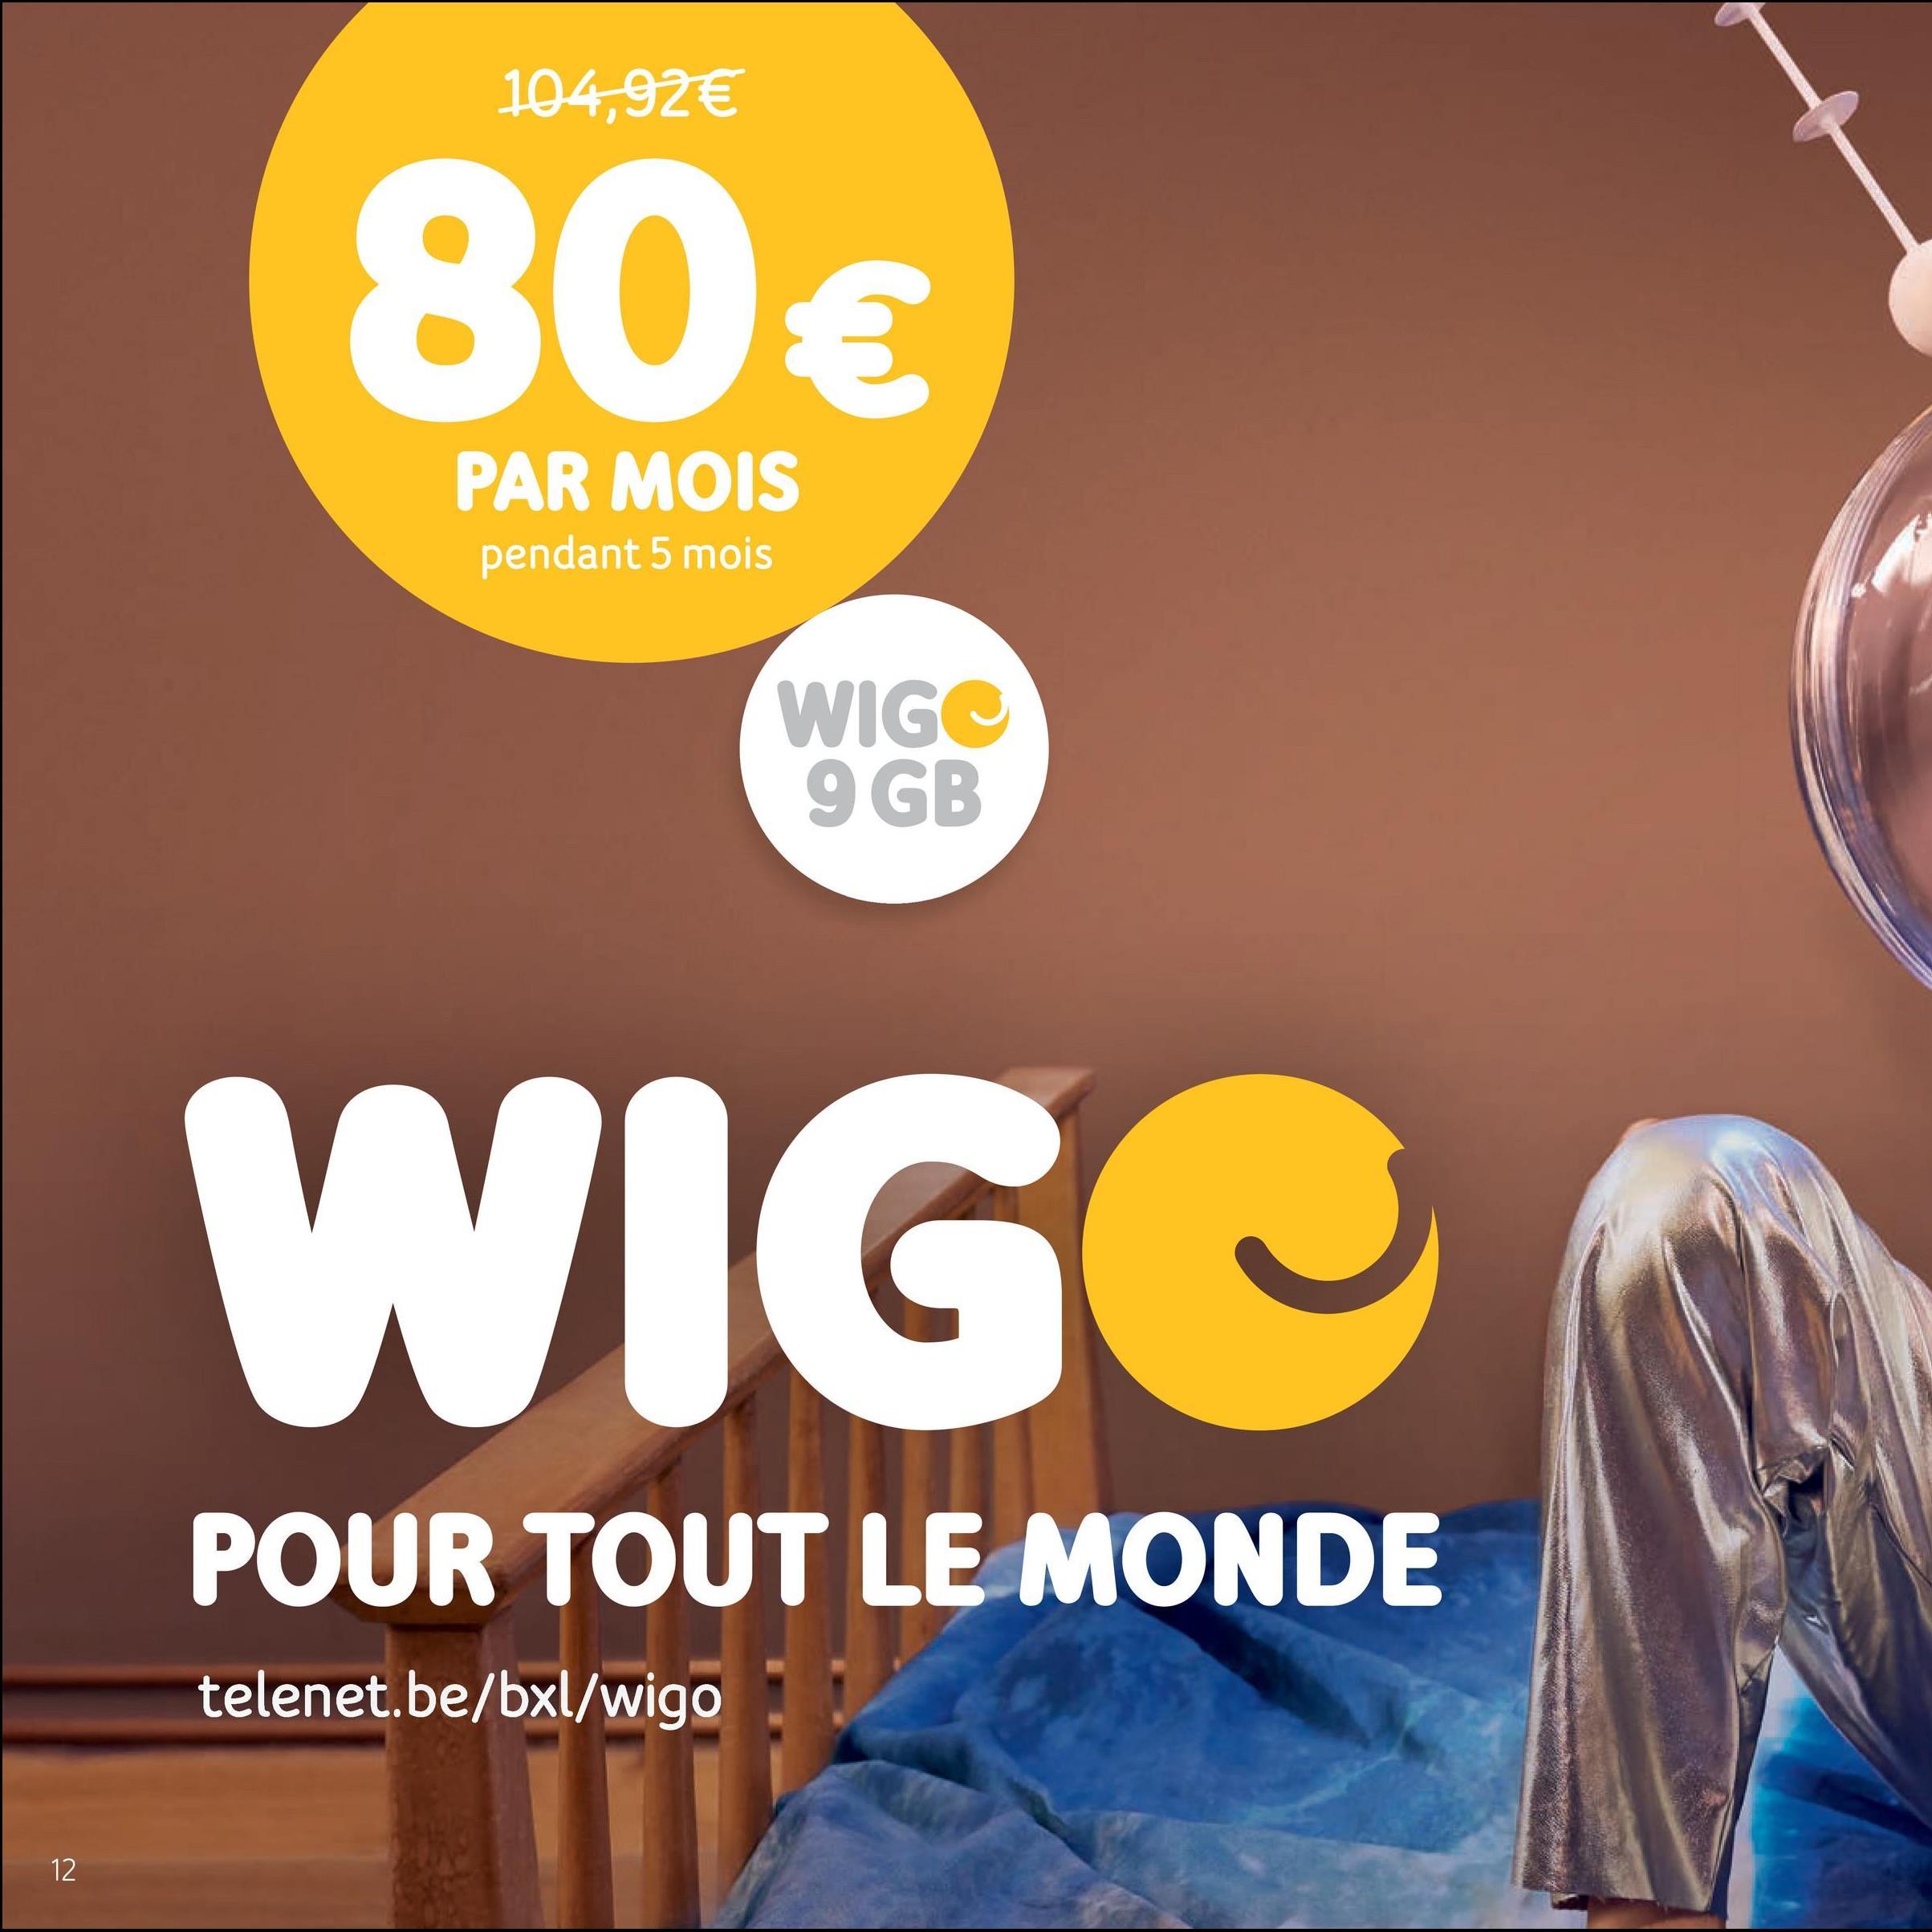 104,92€ 80€ PAR MOIS pendant 5 mois WIGC 9 GB WIG POUR TOUT LE MONDE telenet.be/bxl/wigo: